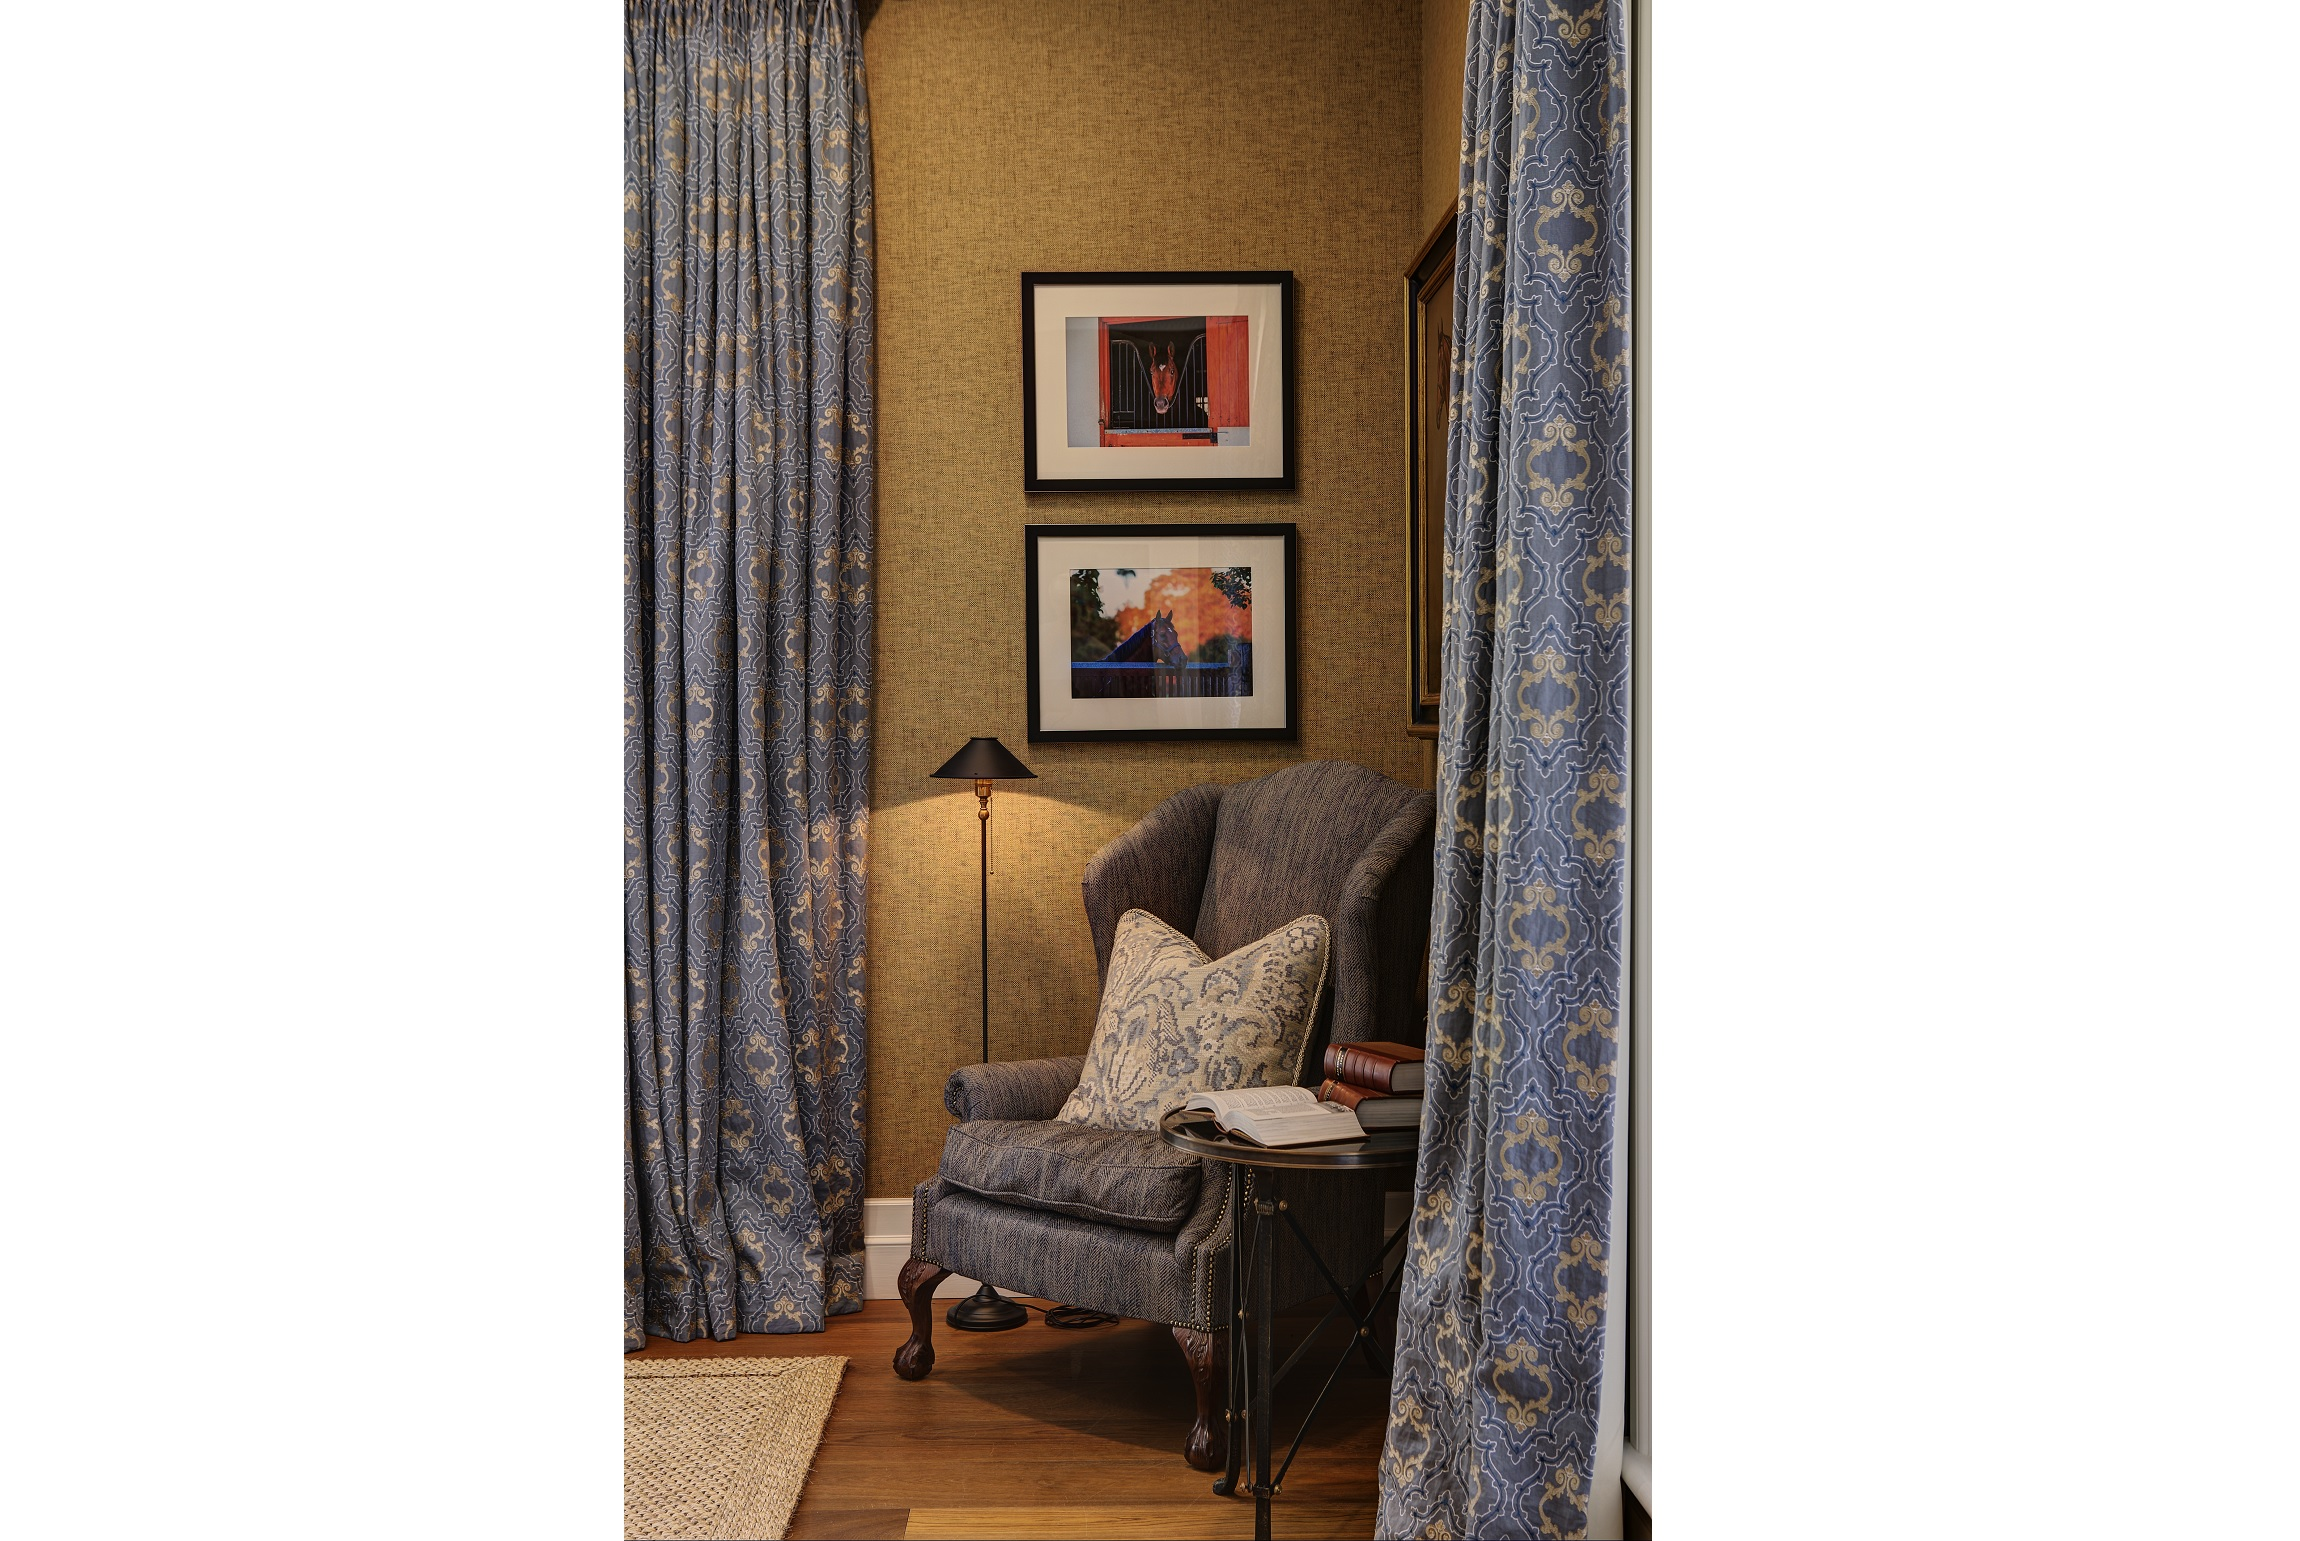 Horse-Stud-Armchair-Interior-Decoration-Hunter-Valley-Michael-Bell-Architects-Sydney